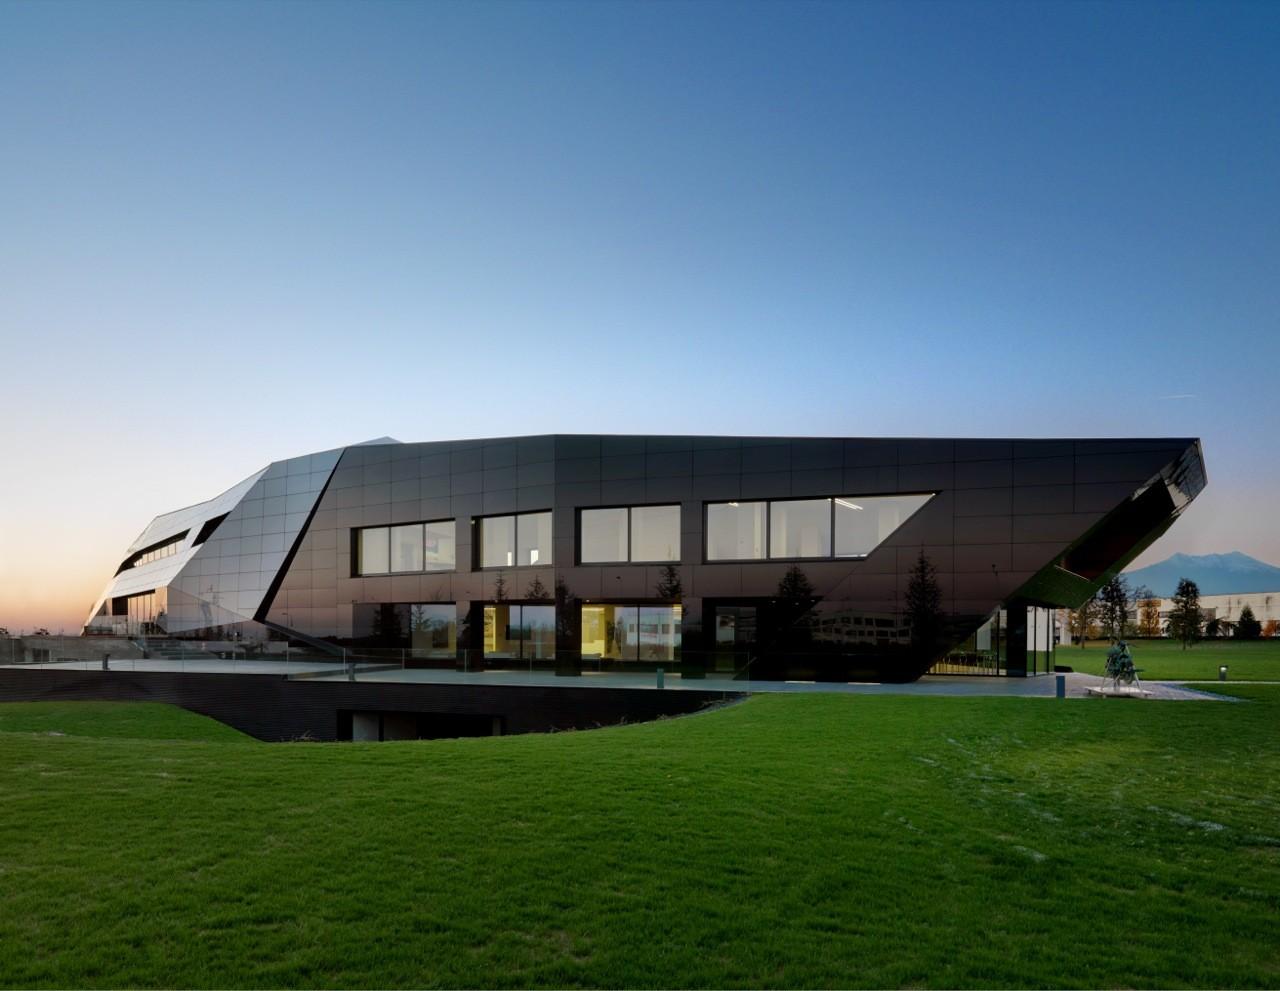 Oficina Vidre Negre / Damilano Studio Architects